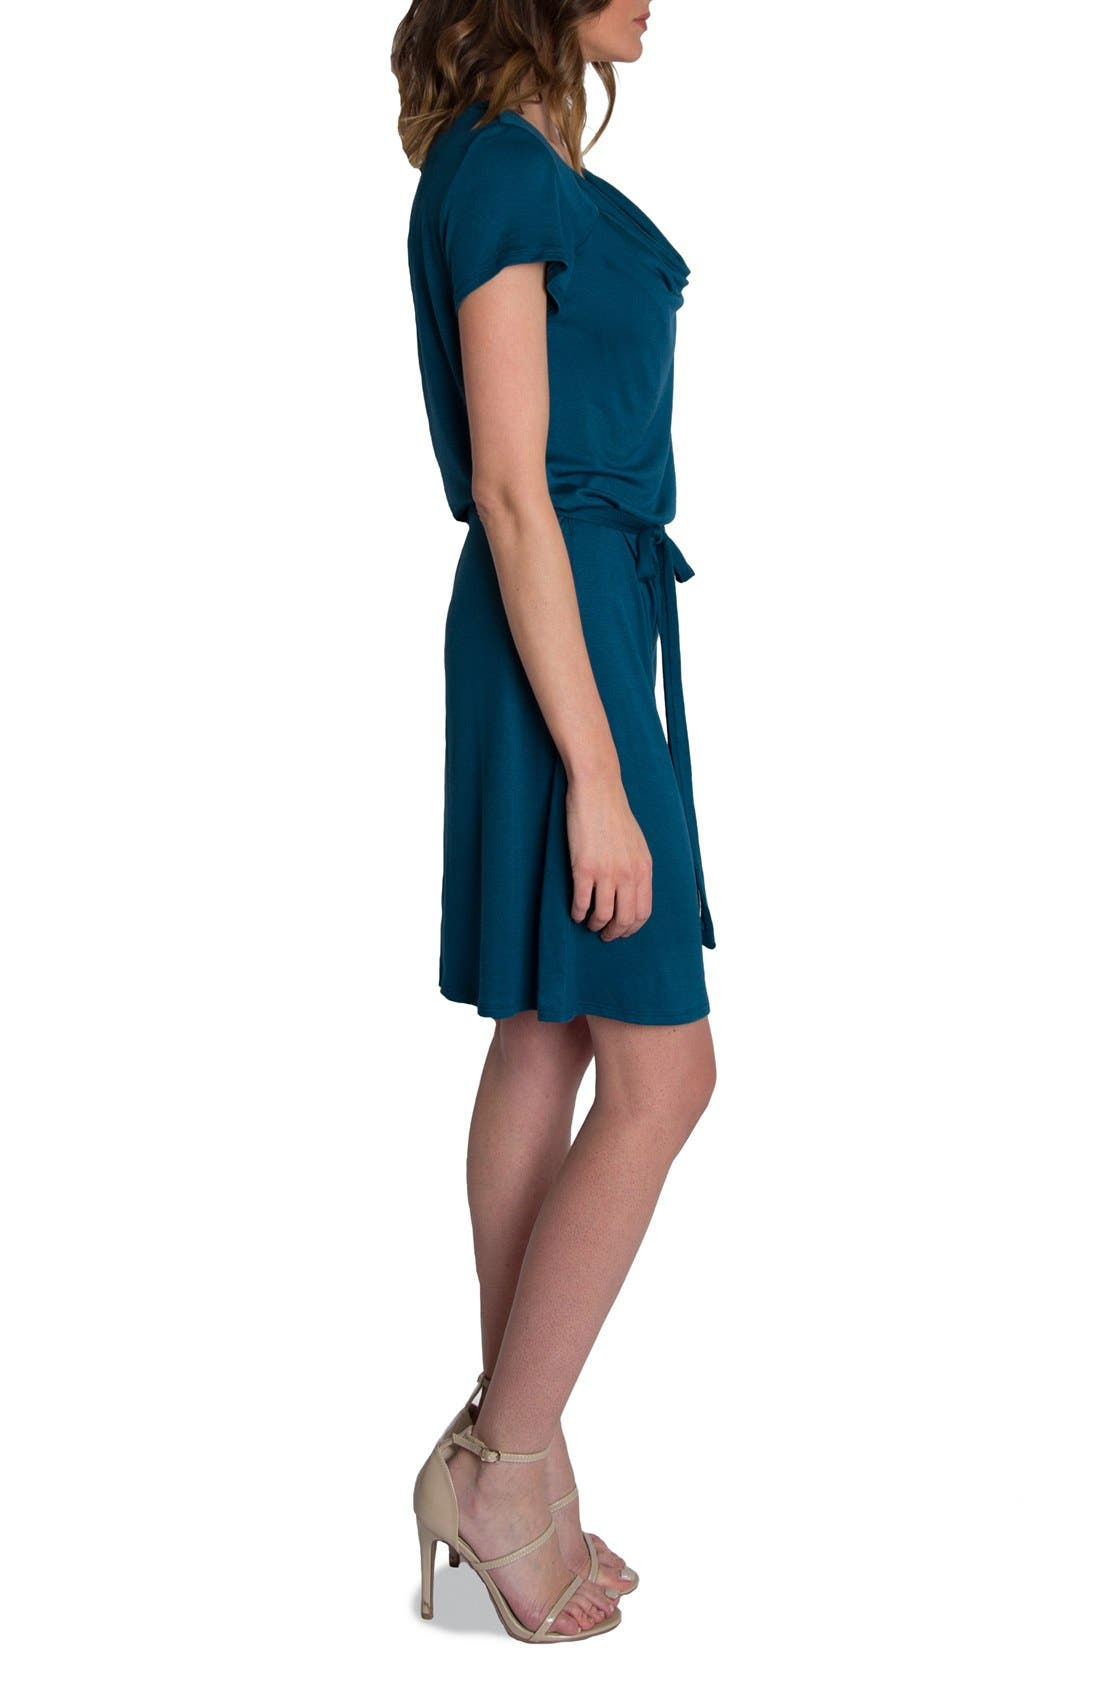 'Chic' Cowl Neck Nursing Dress,                             Alternate thumbnail 3, color,                             Teal